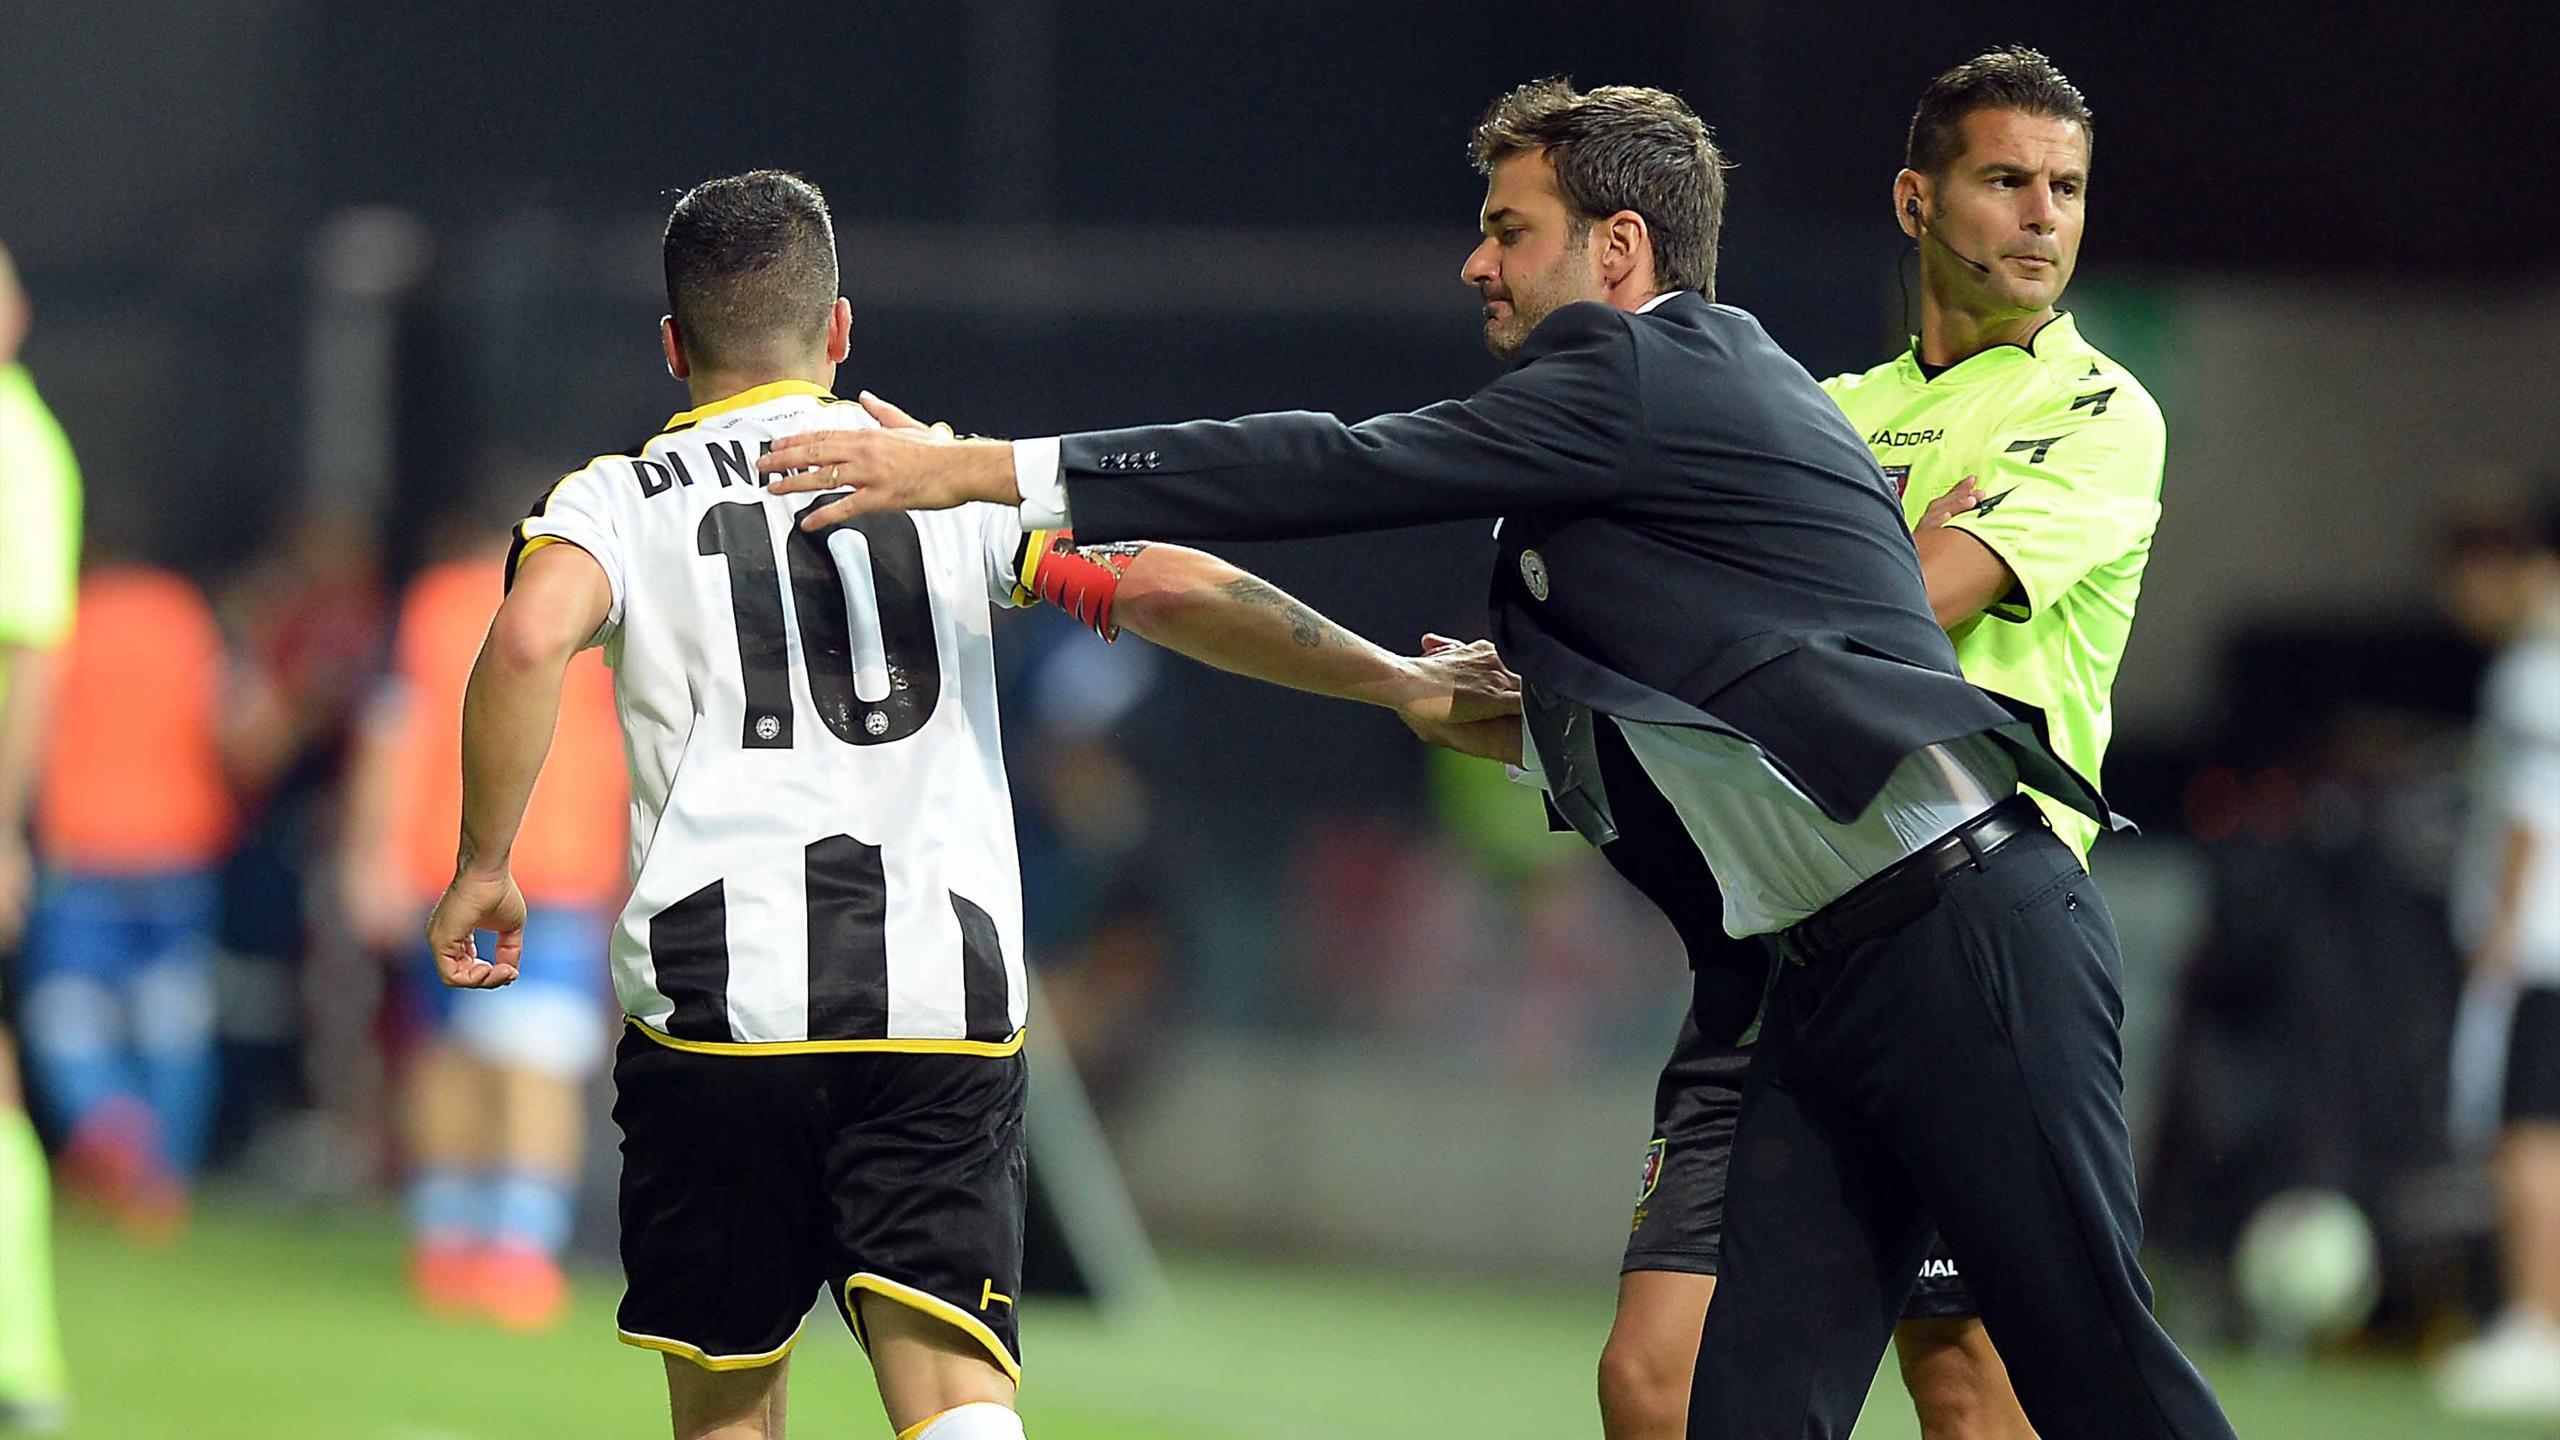 Empoli vs Udinese 1-2: Di Natale-Widmer, friulani ottavi